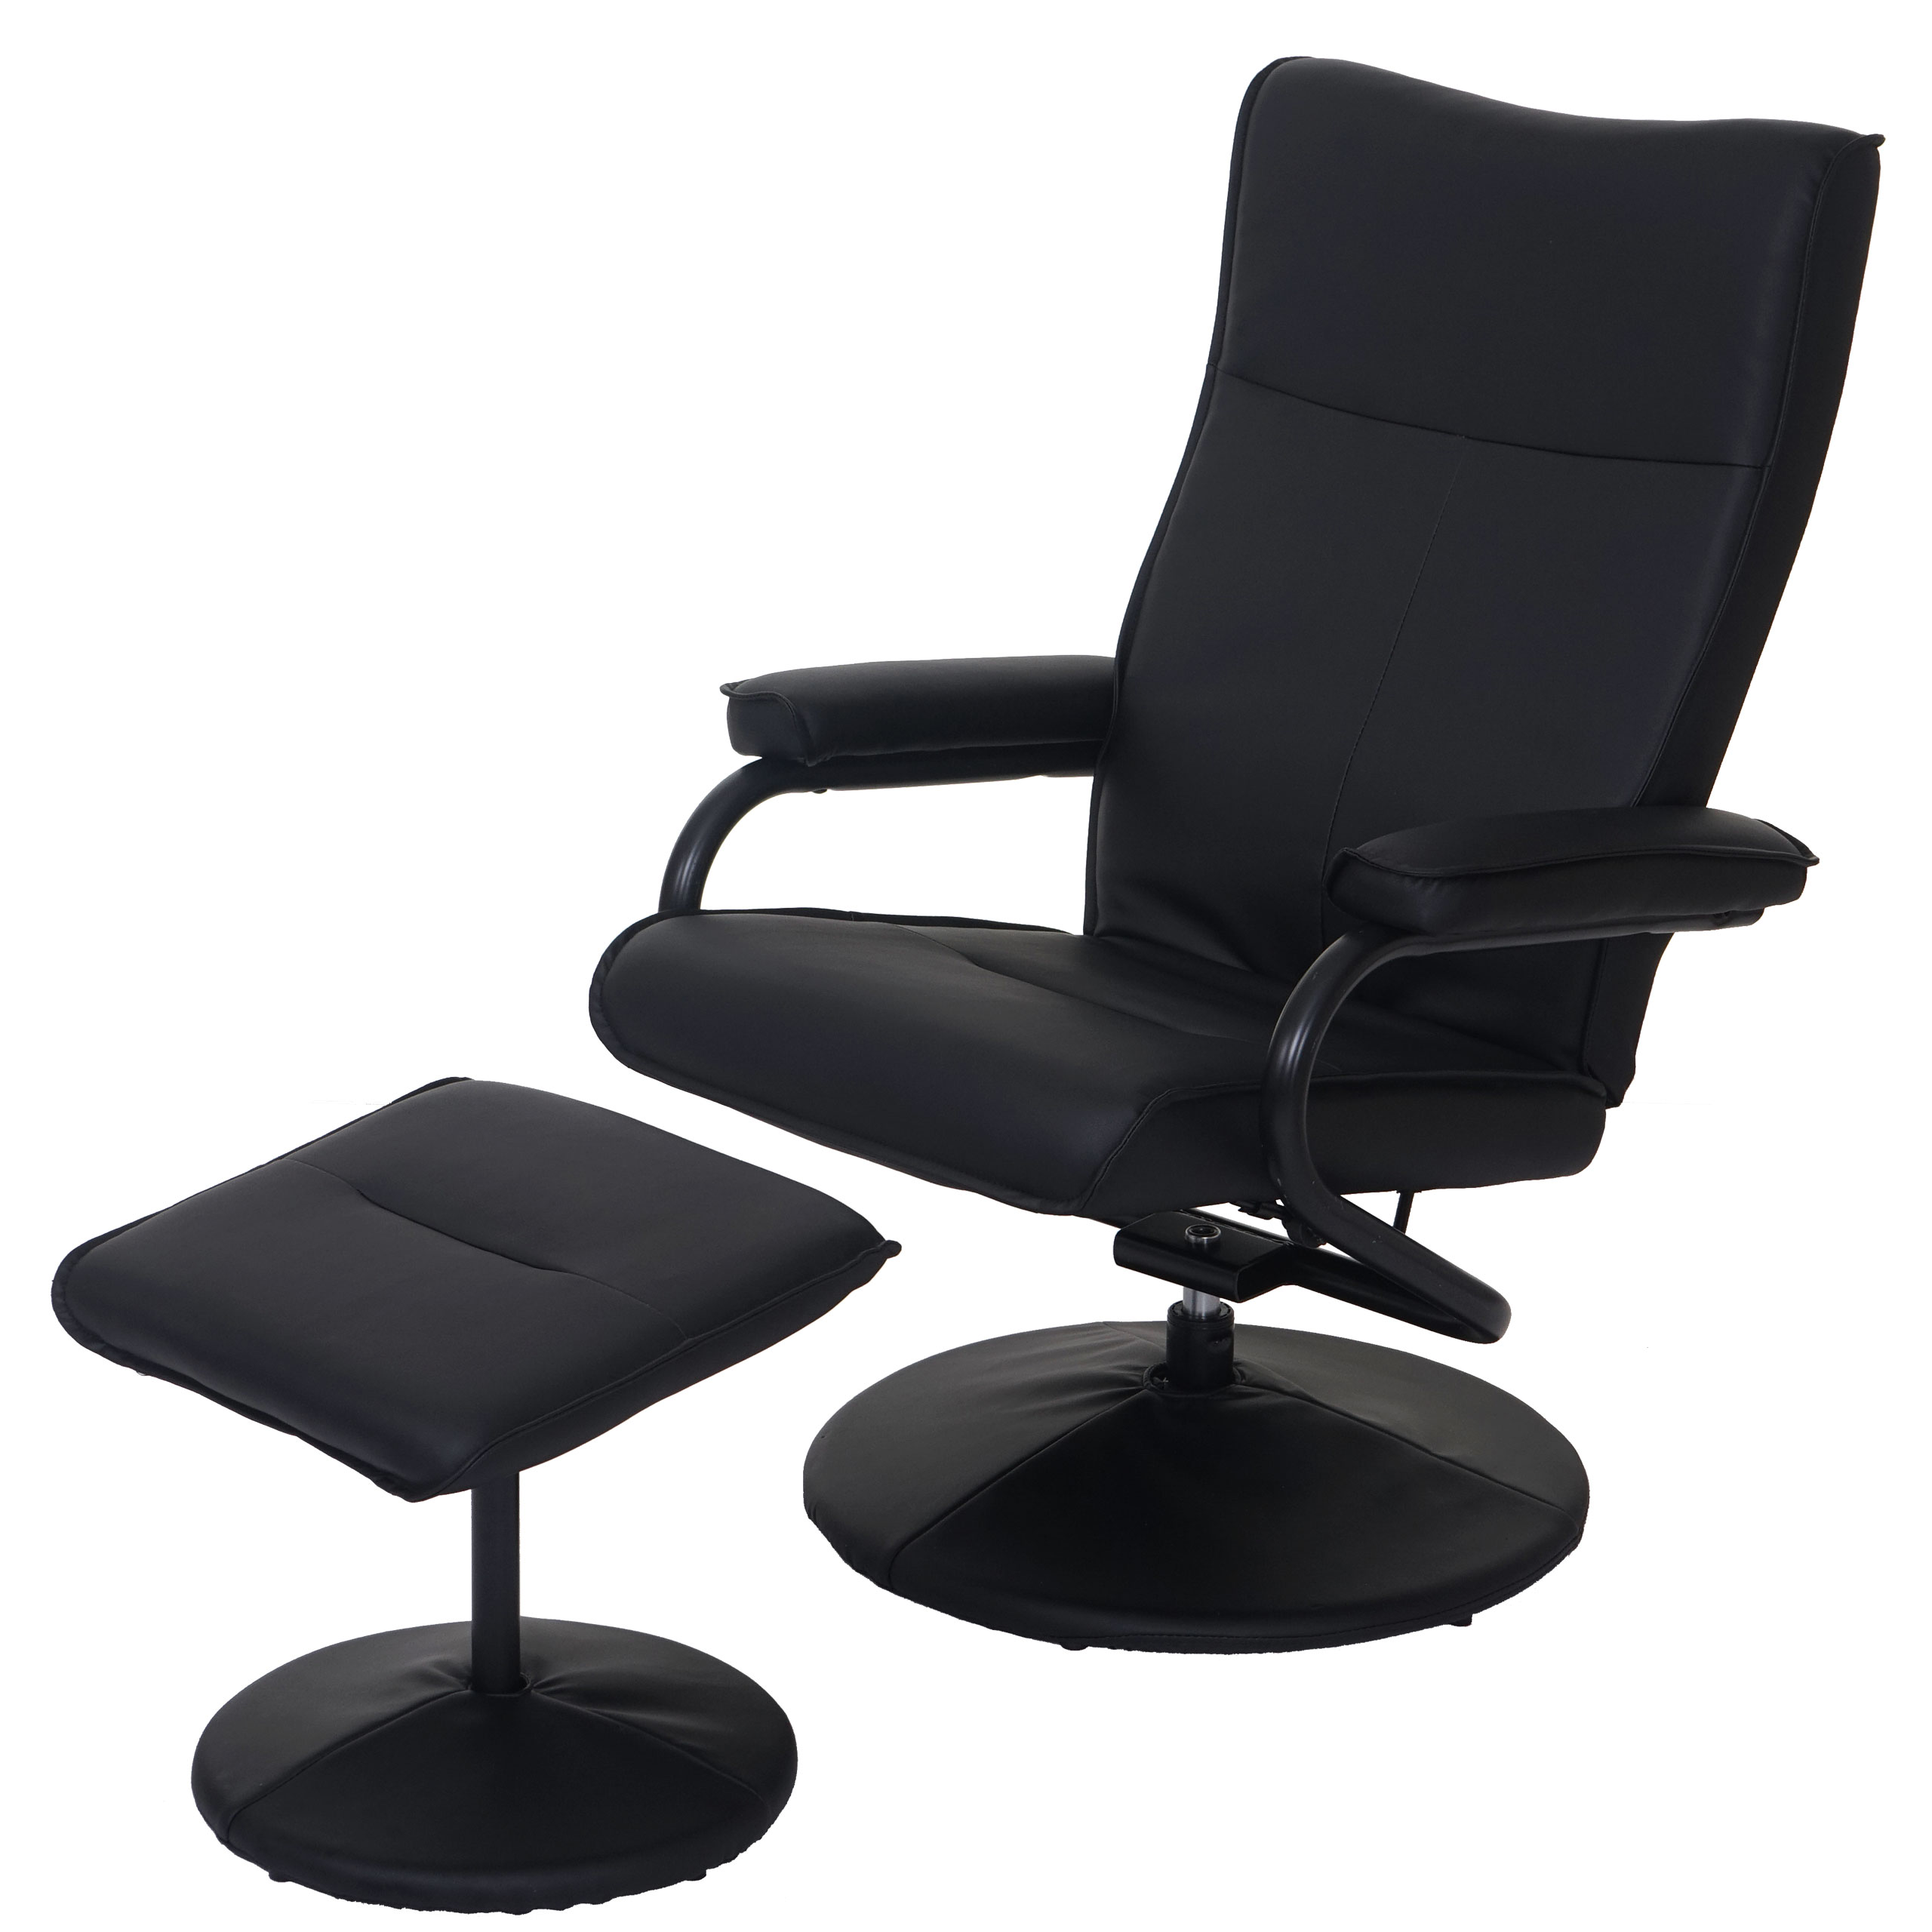 fernsehsessel leeds relaxsessel sessel mit hocker. Black Bedroom Furniture Sets. Home Design Ideas